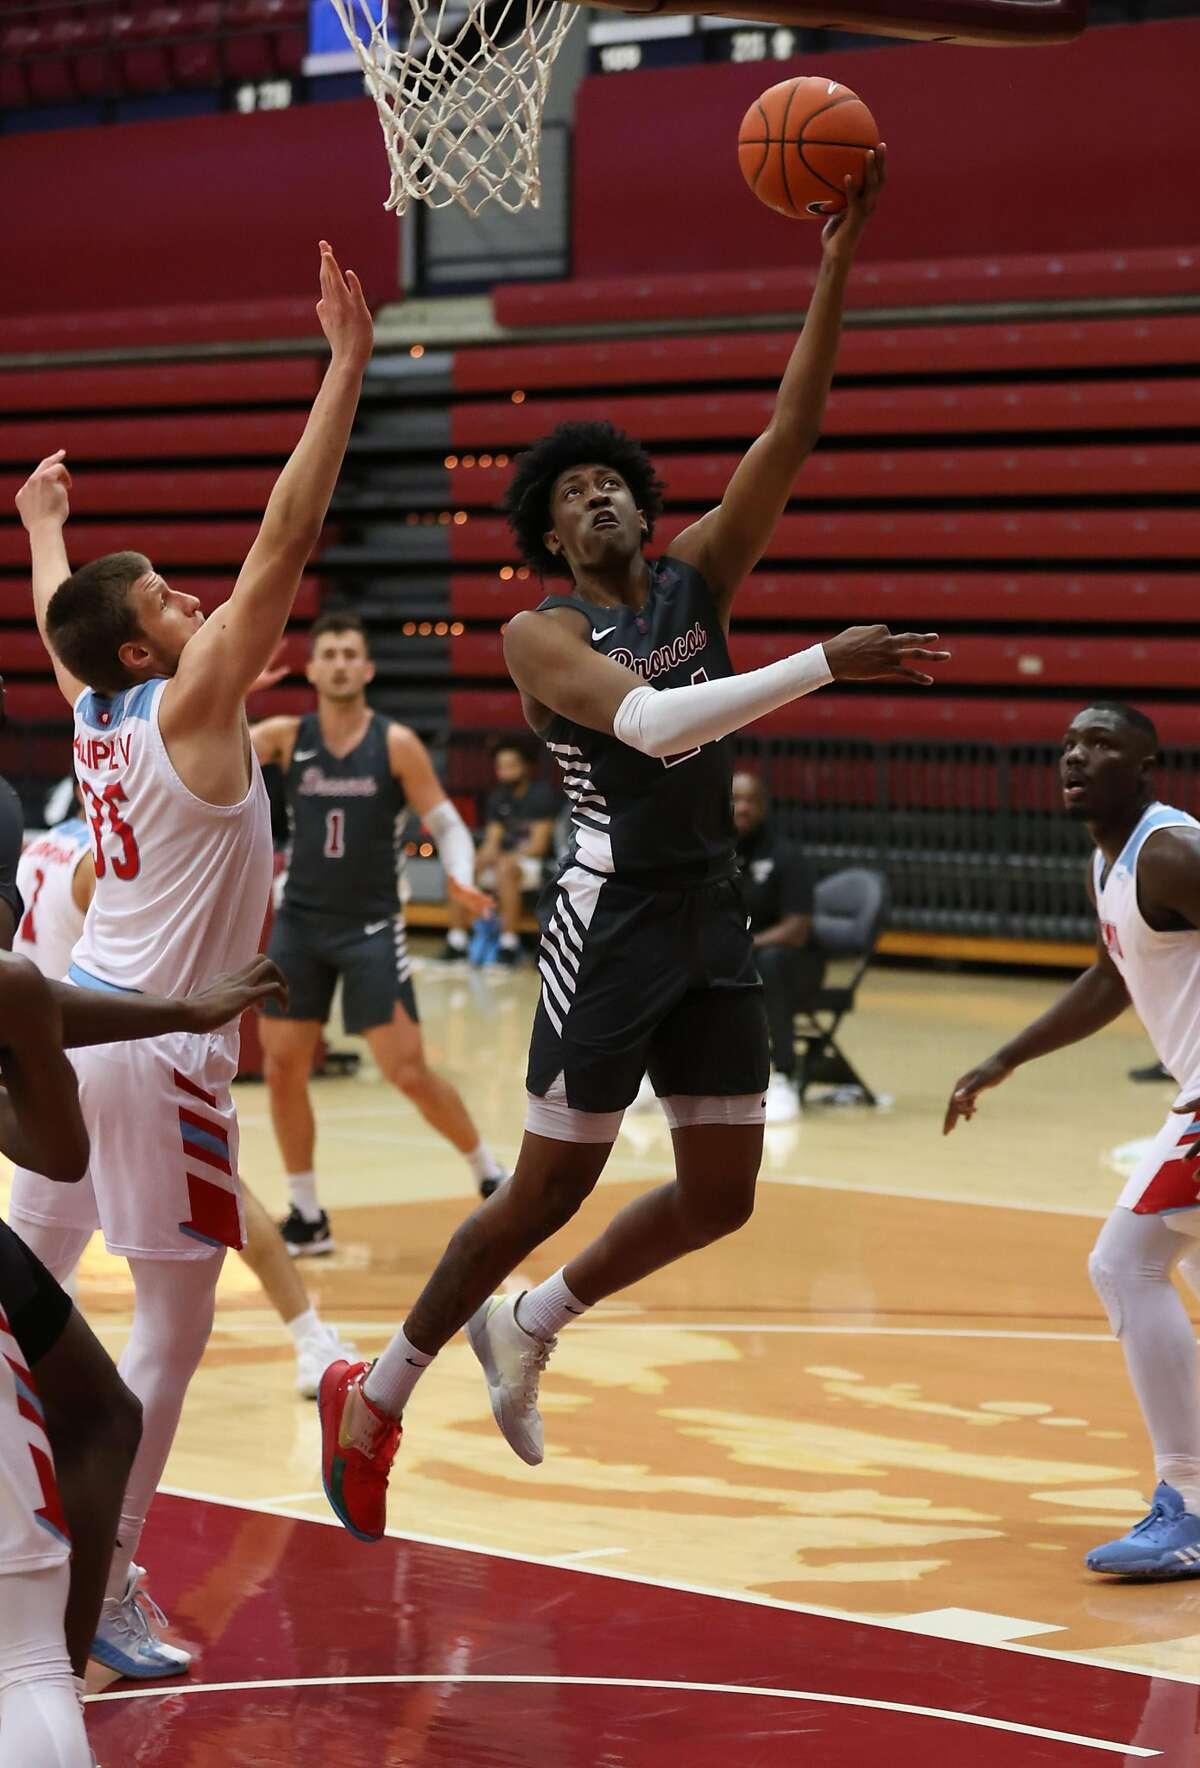 Santa Clara's Jalen Williams scored 18 points against Loyola Marymount.